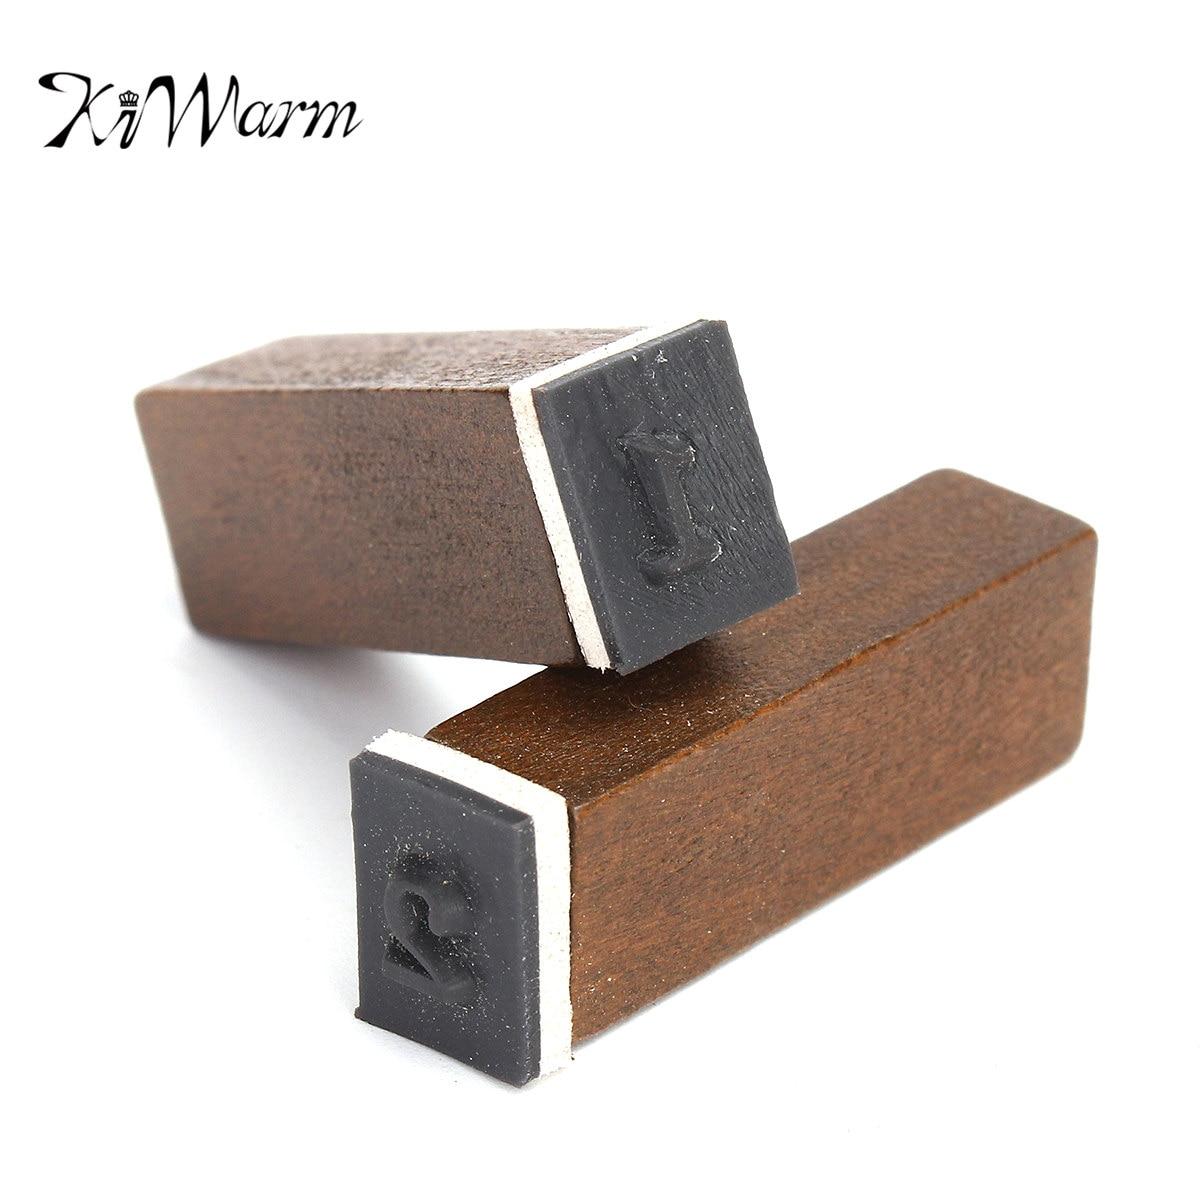 KiWarm 70pcs Set Stamp Korean Number Alphabet Handwriting Capital Wooden Box Rubber Stamp Gift For Kids